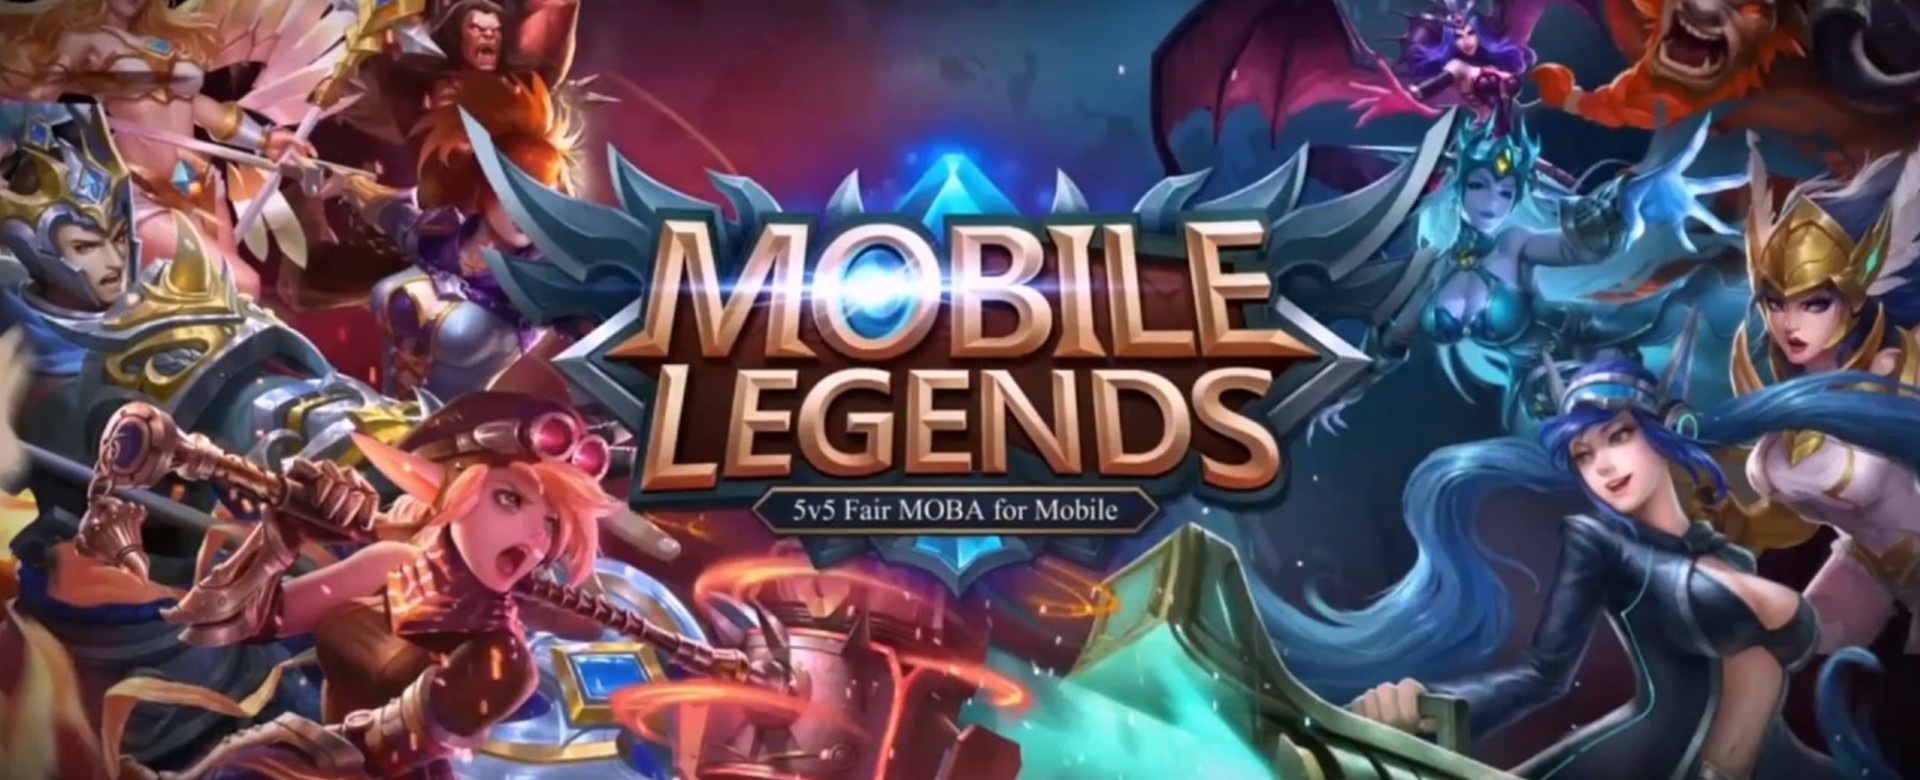 Mobile Legends - Imagem 1 do software